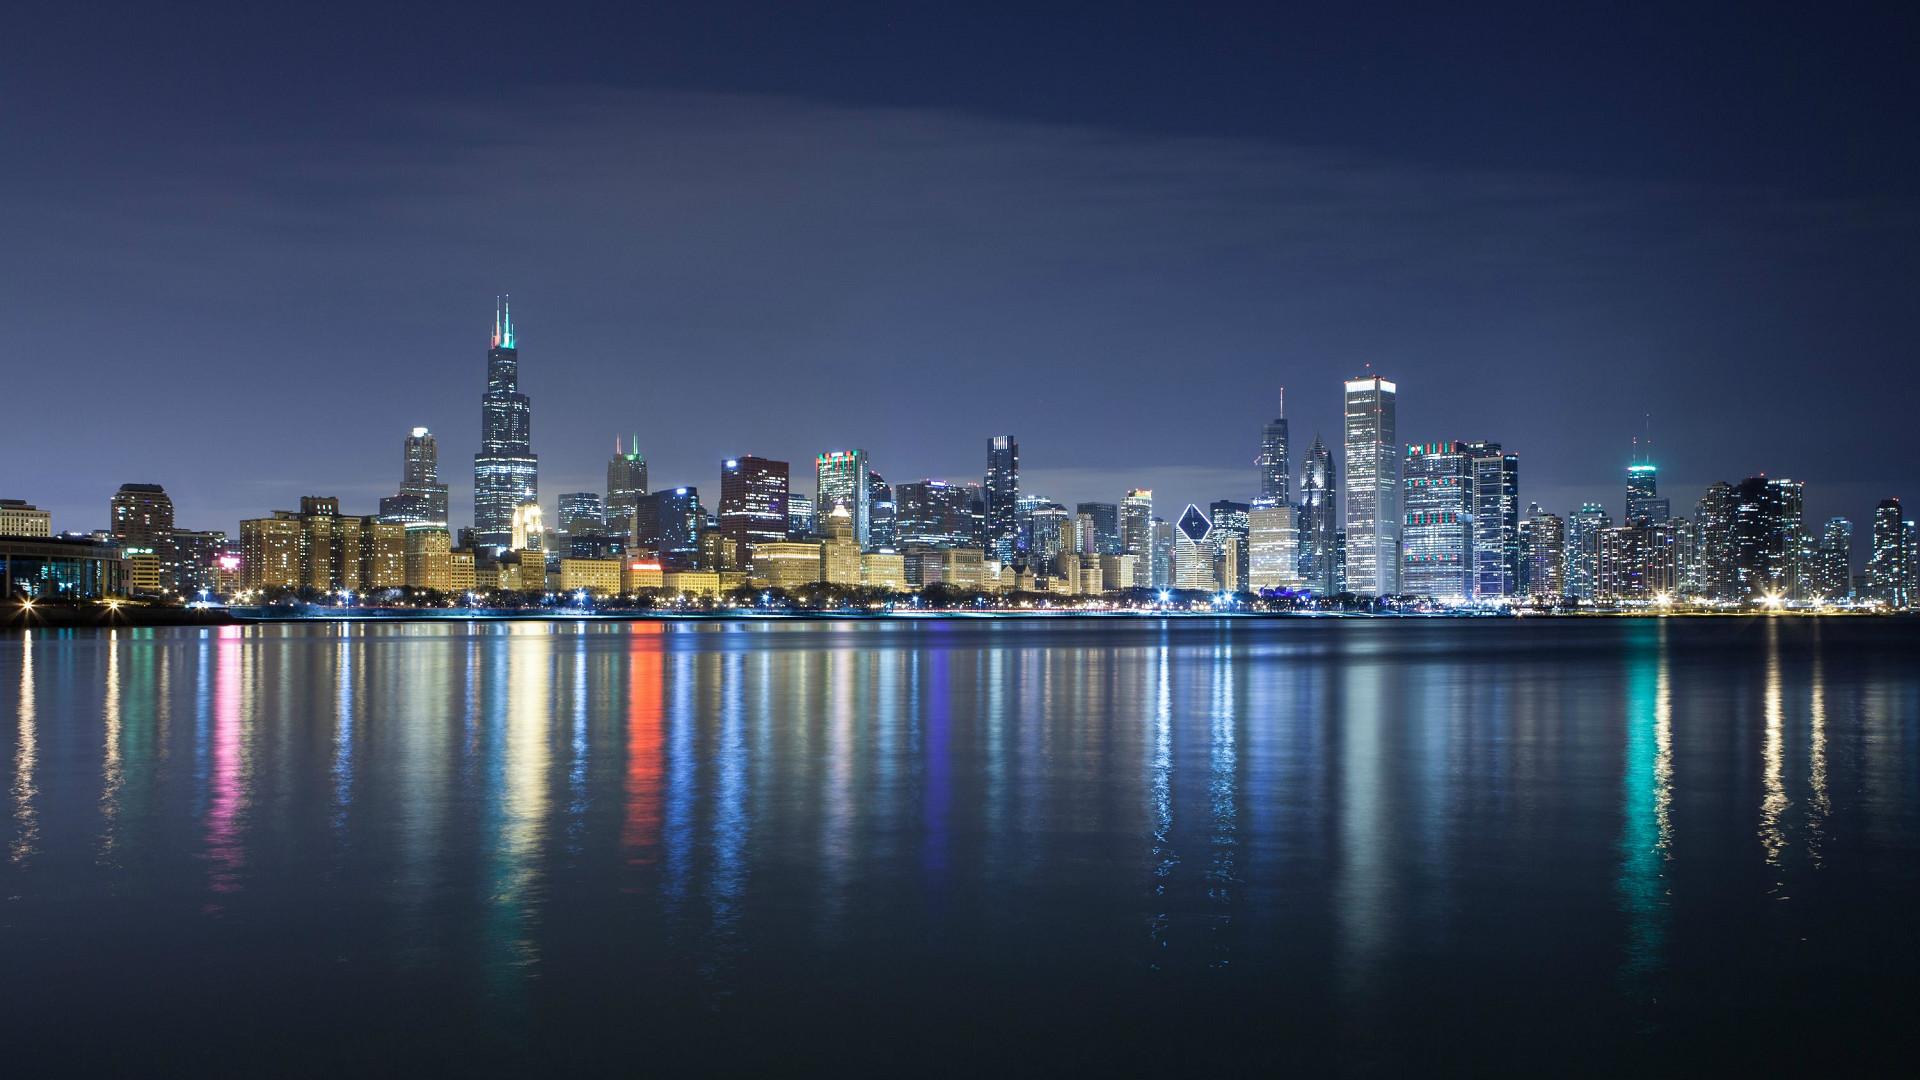 Chicago Skyline Wallpaper 1920x1080 74 Images